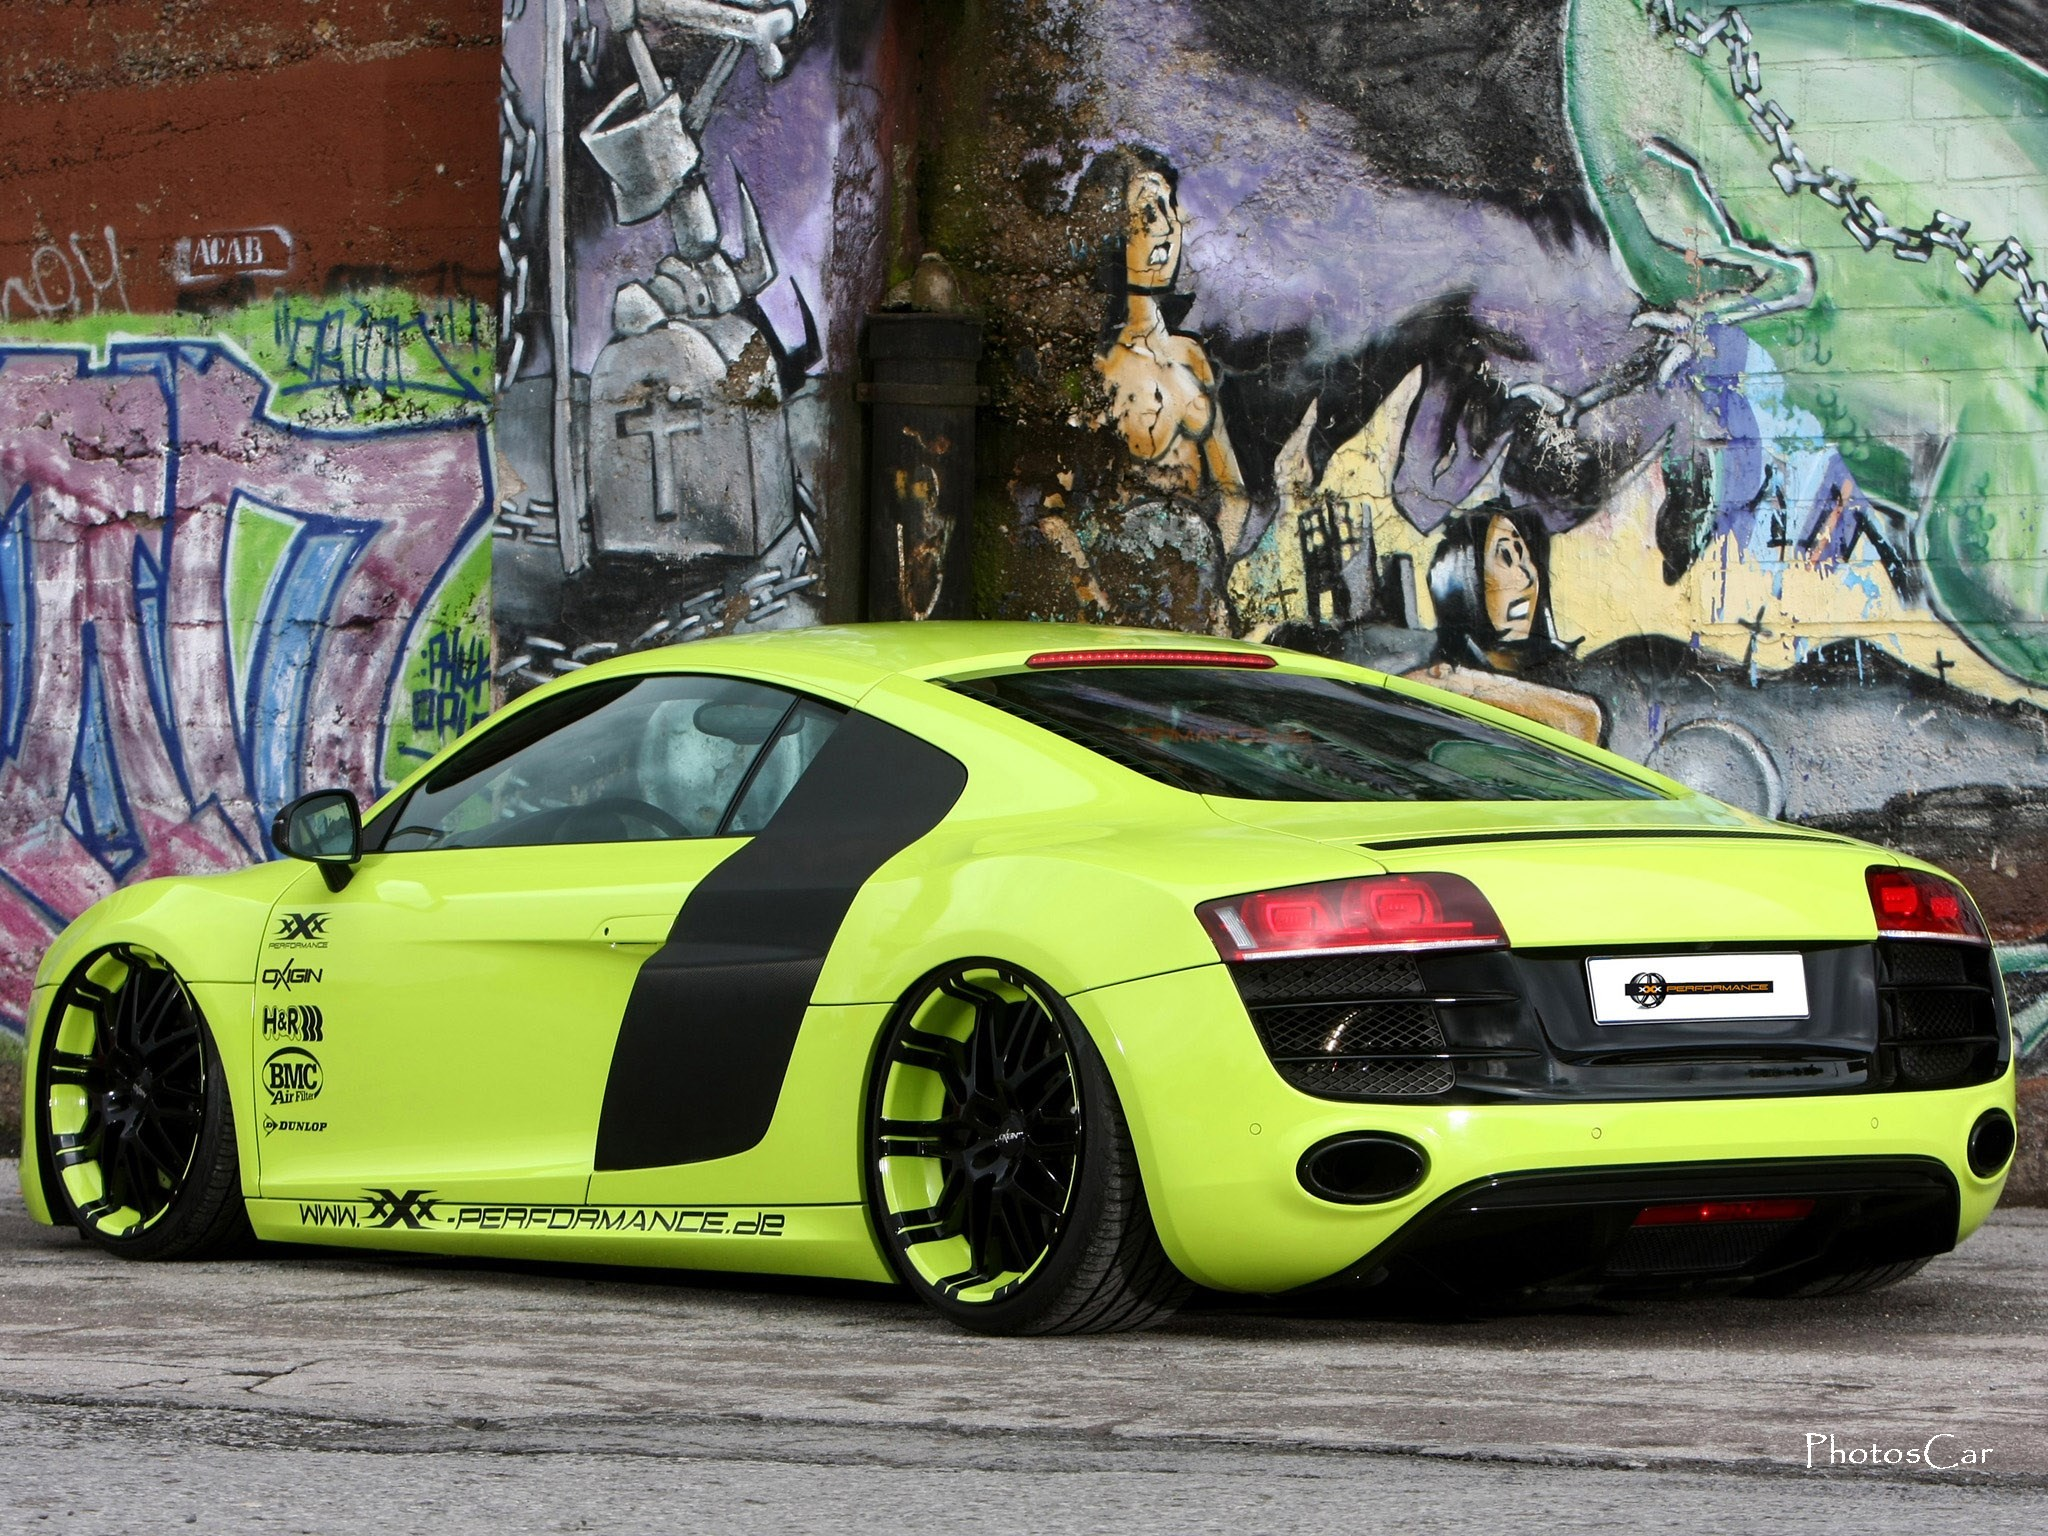 2012 xXx Performance - Audi R8 V10